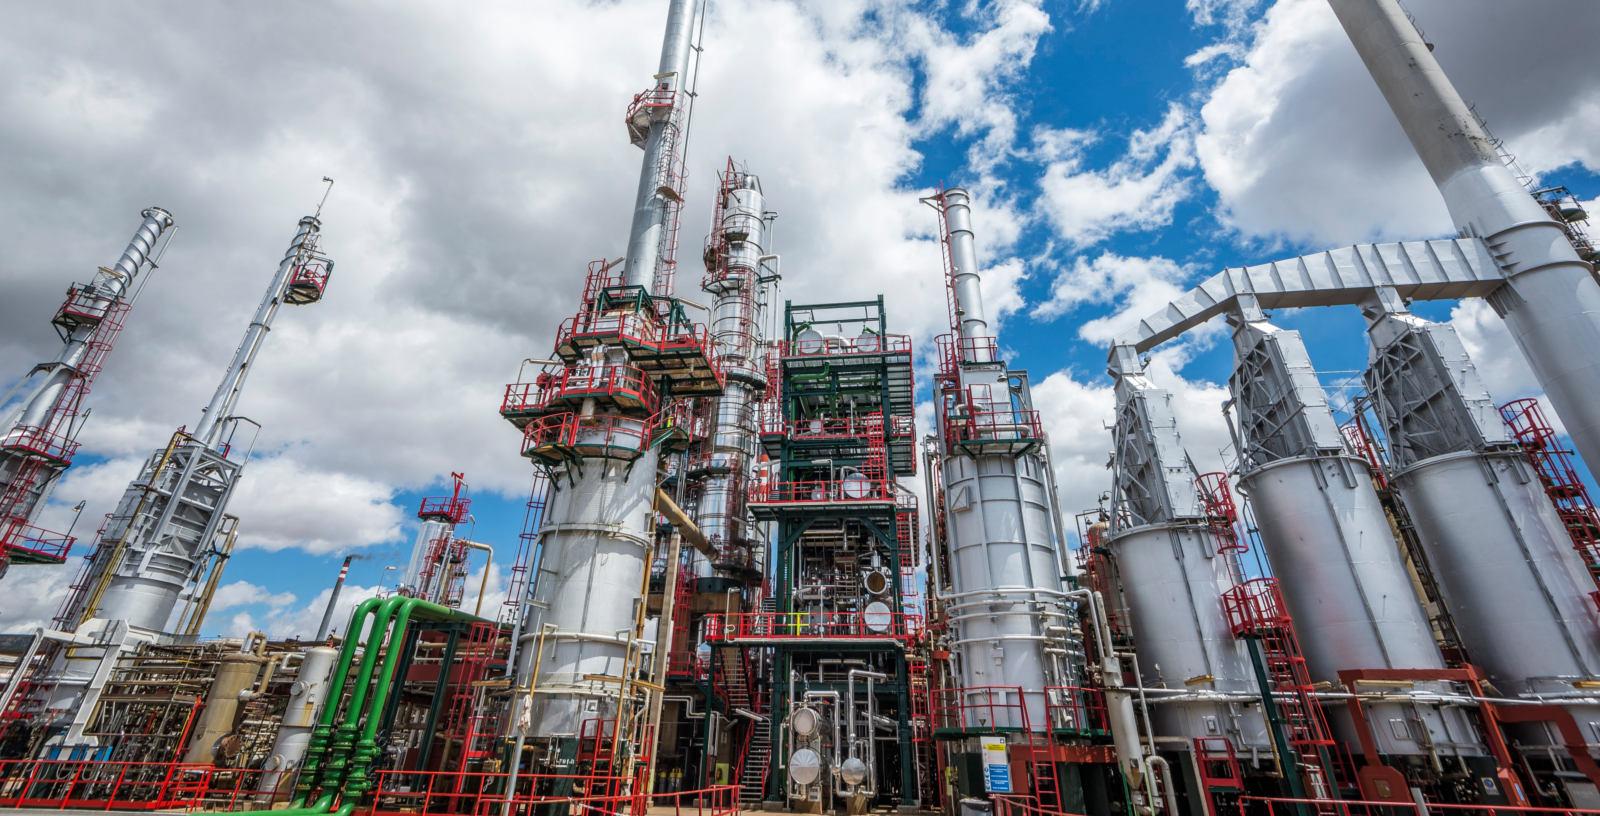 Refinery_Puertollano_IDOM_1